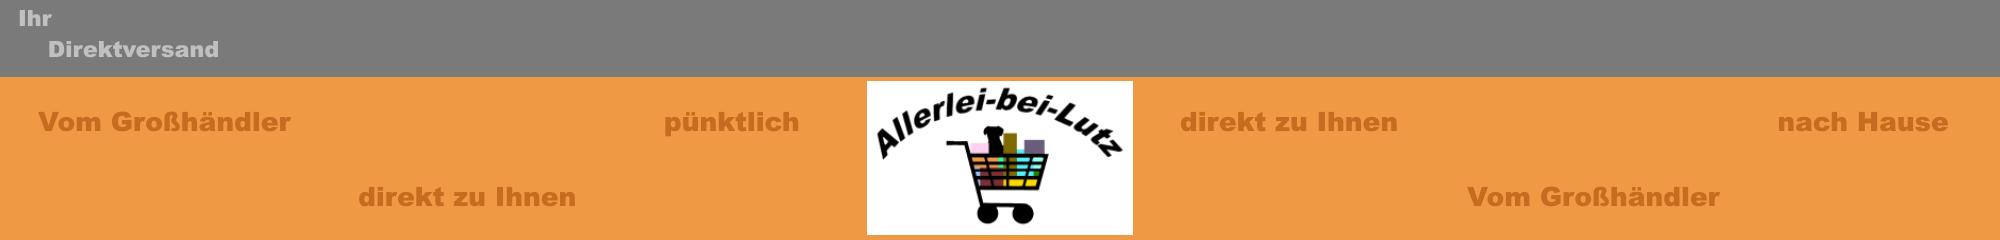 Allerlei-bei-Lutz Direktversand